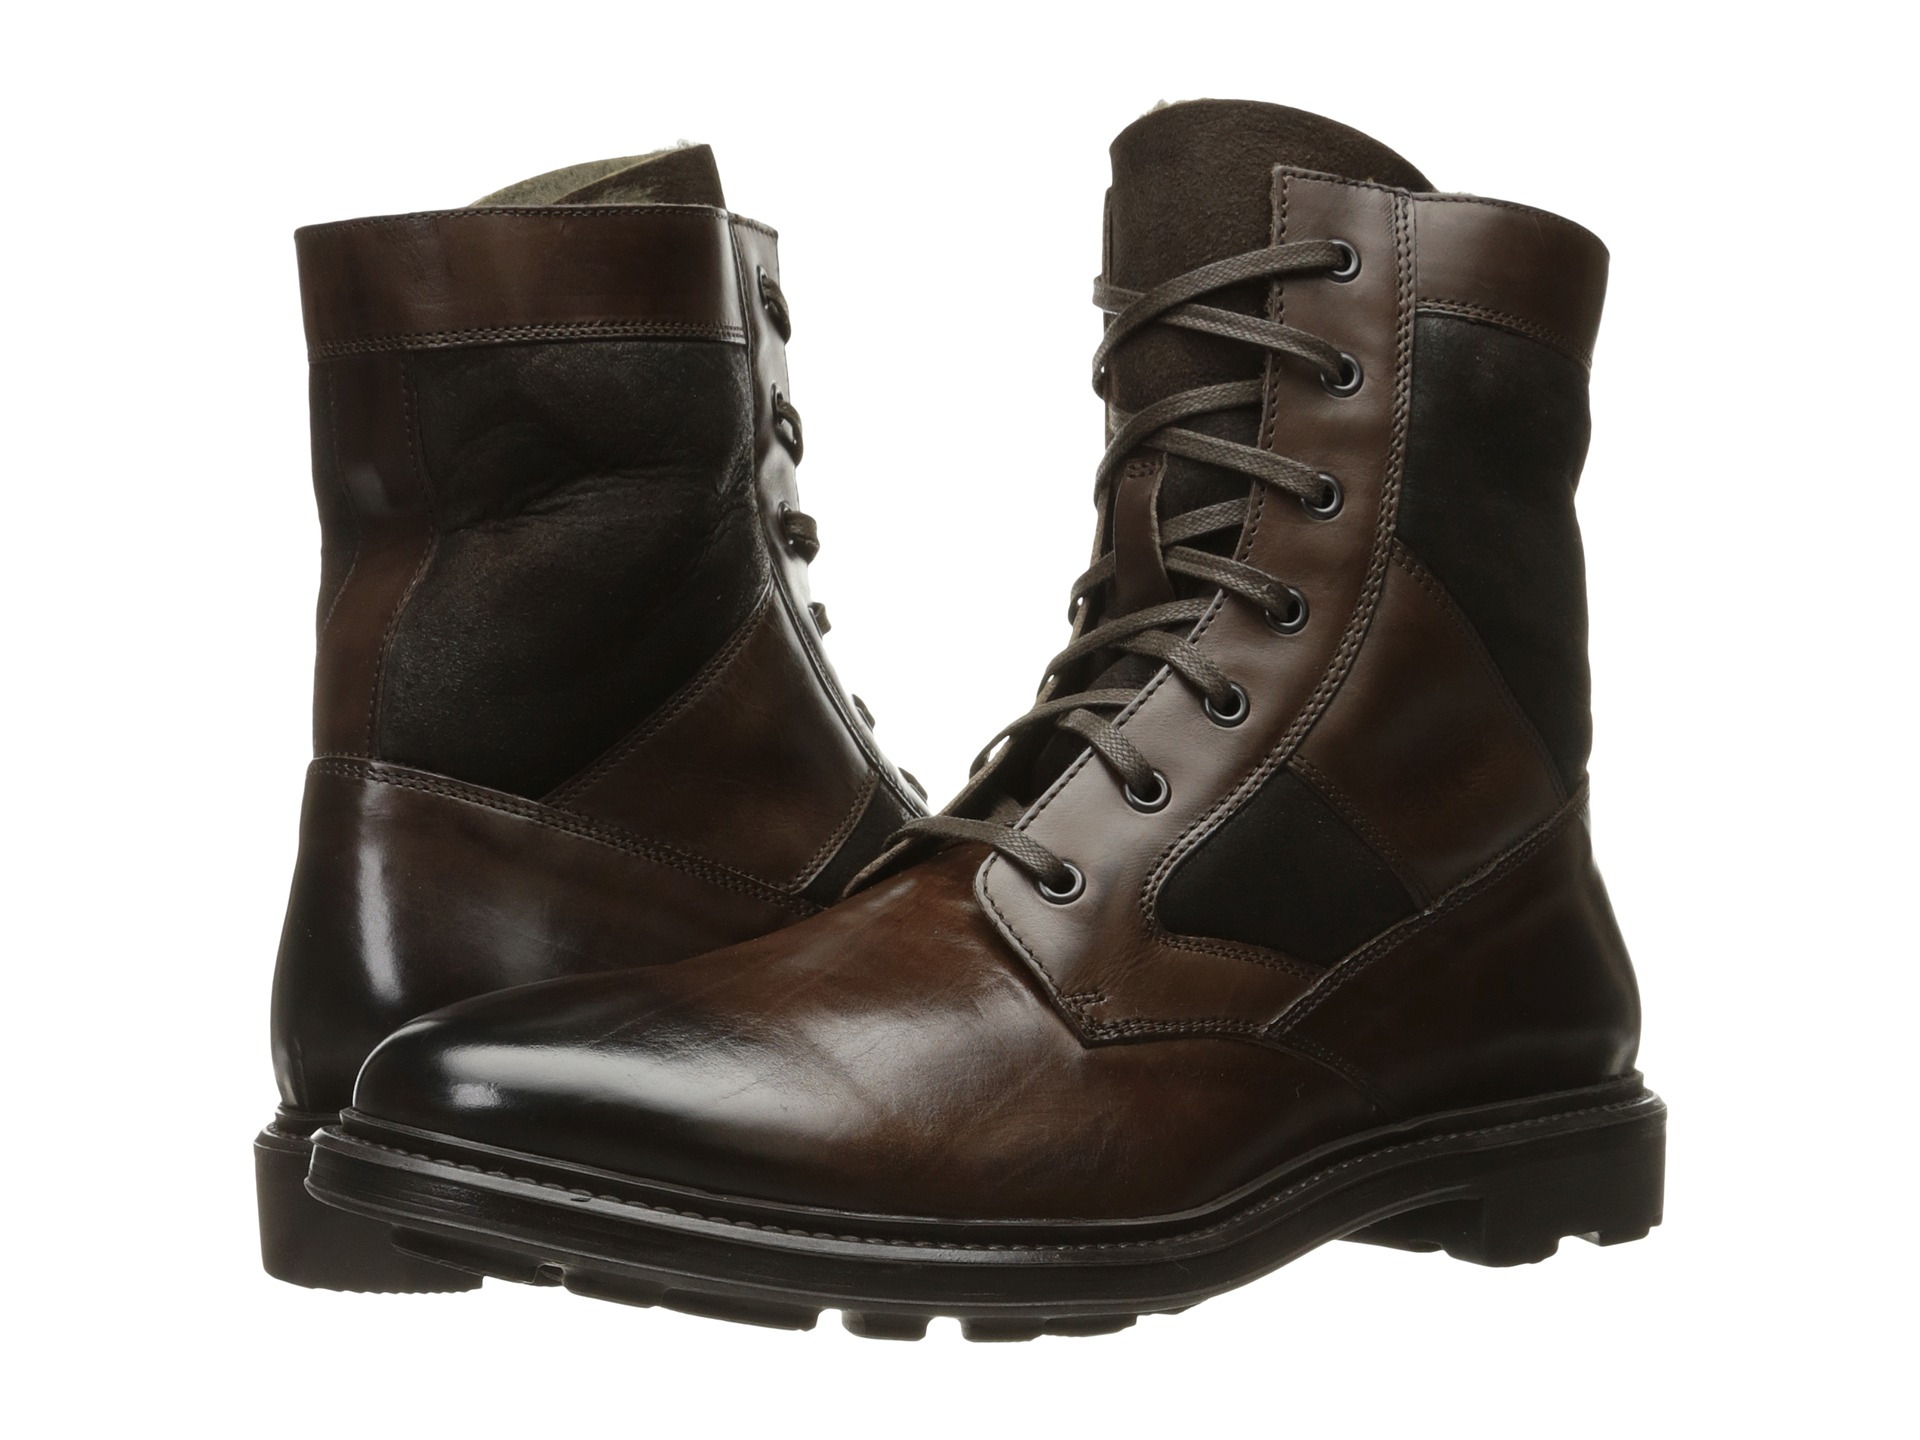 to boot new york tobias brown zappos free shipping